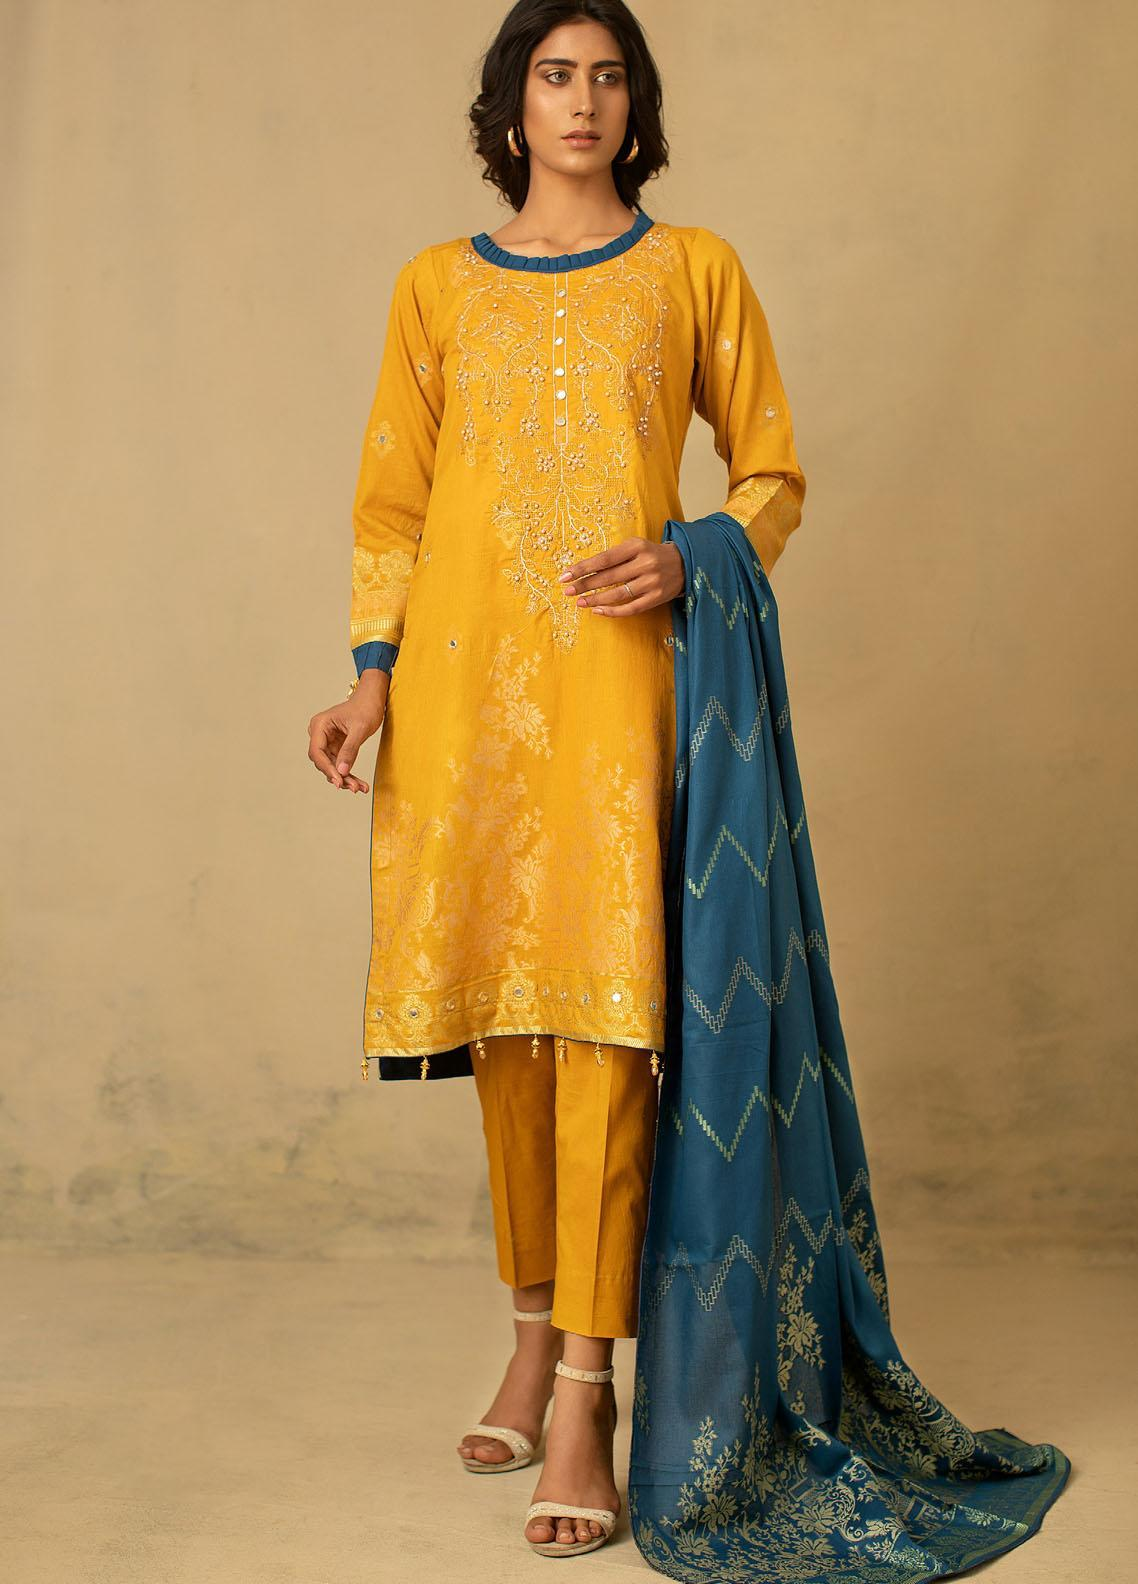 Jahan by AB Textiles Embroidered Jacquard Unstitched 3 Piece Suit AB21JCR 05 Jaune - Casual Collection